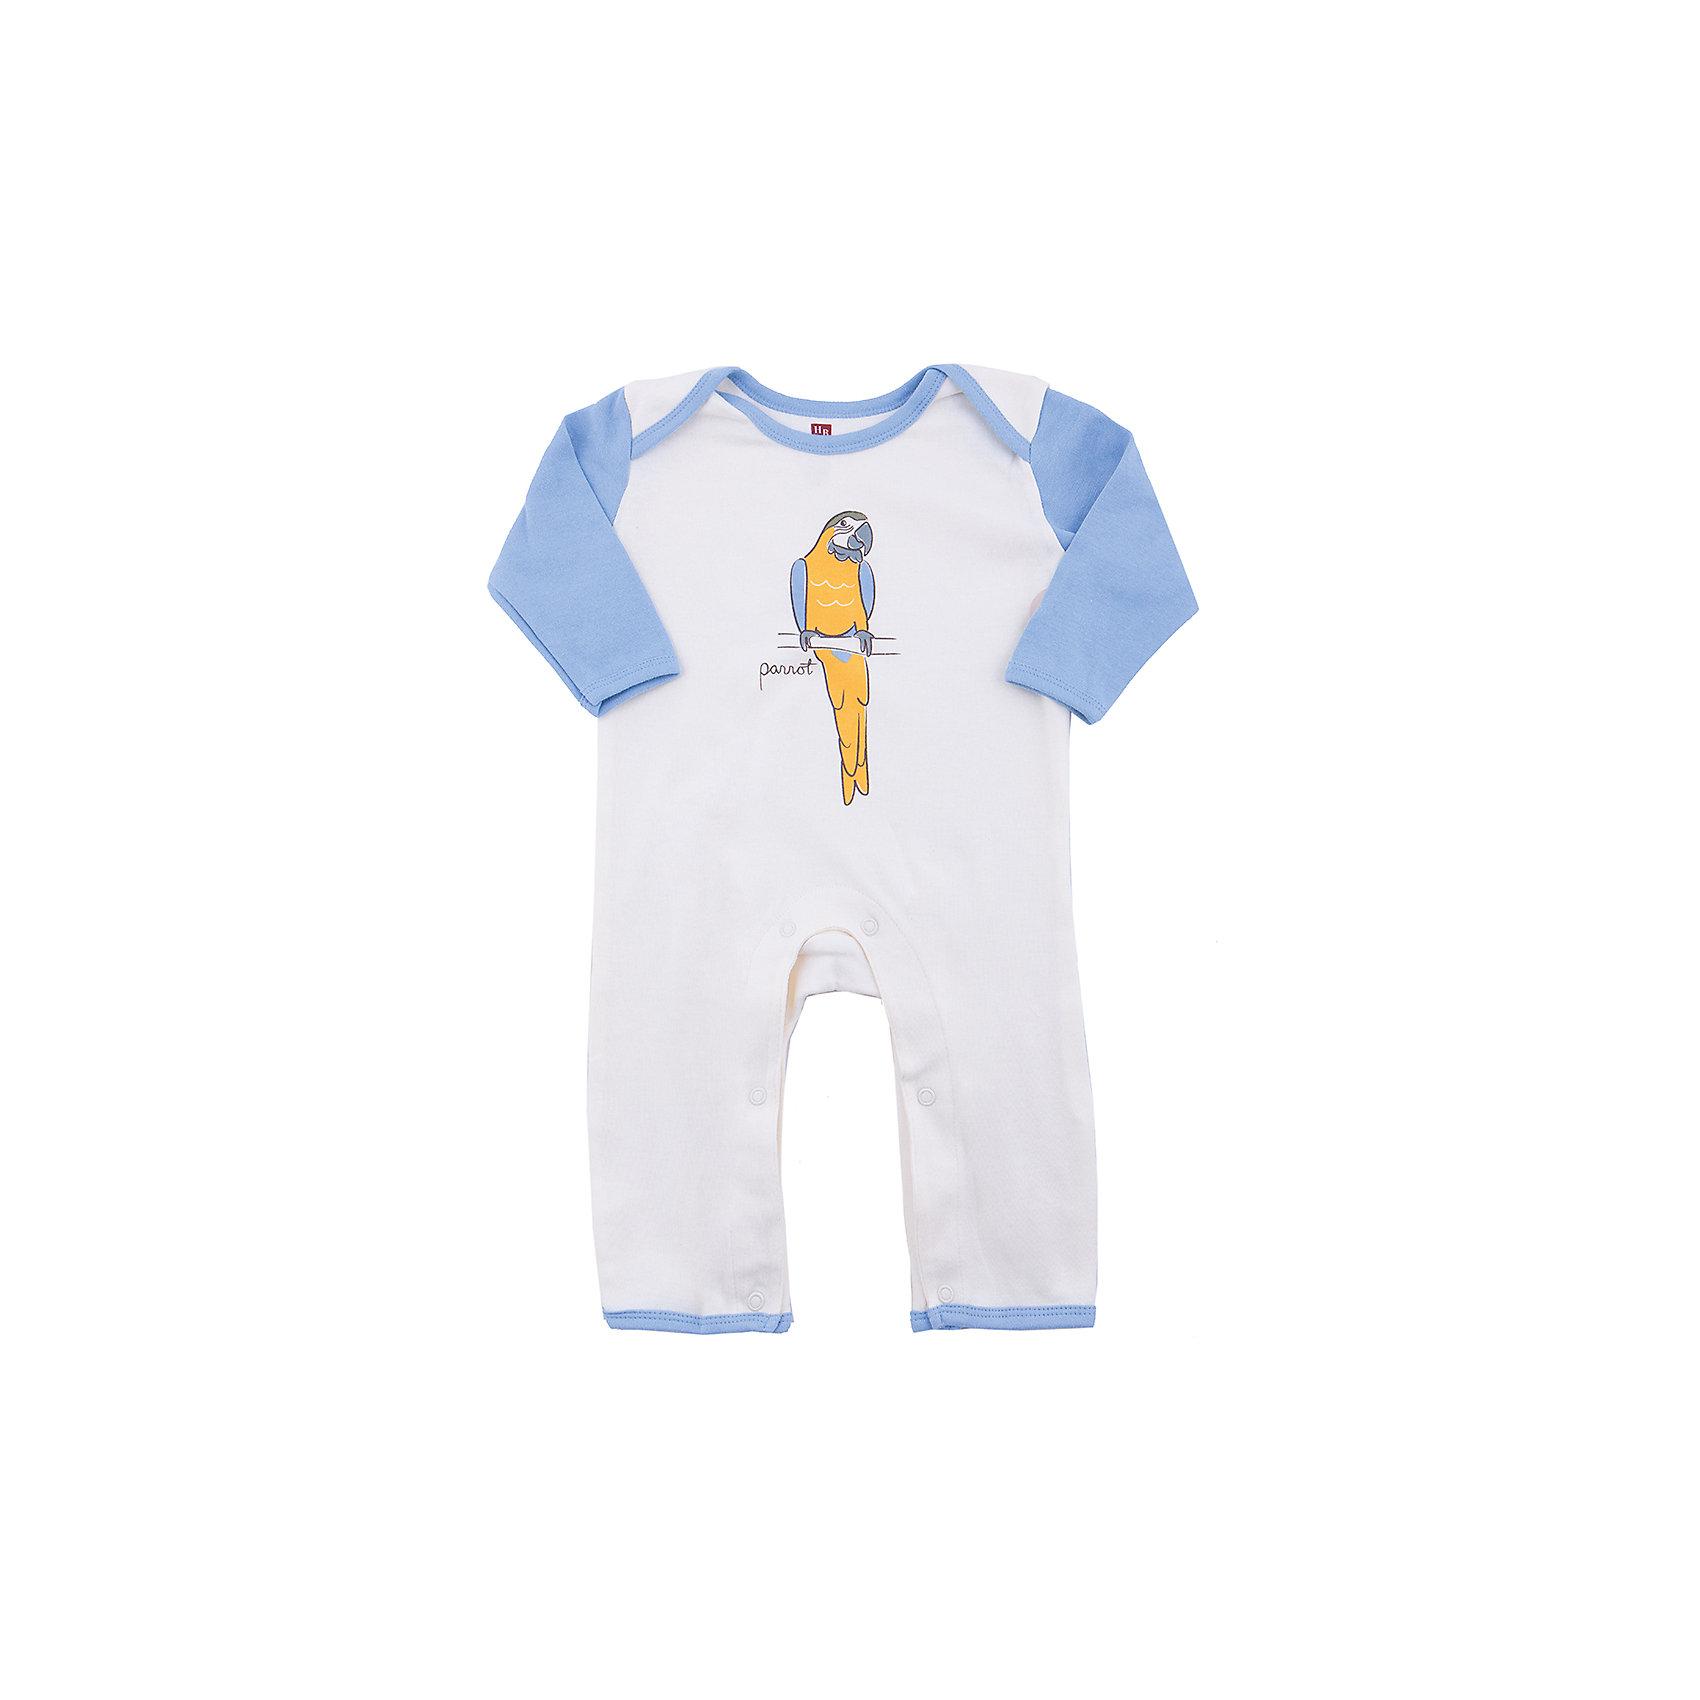 Hudson Baby Комбинезон для мальчика Hudson Baby hudson baby детская